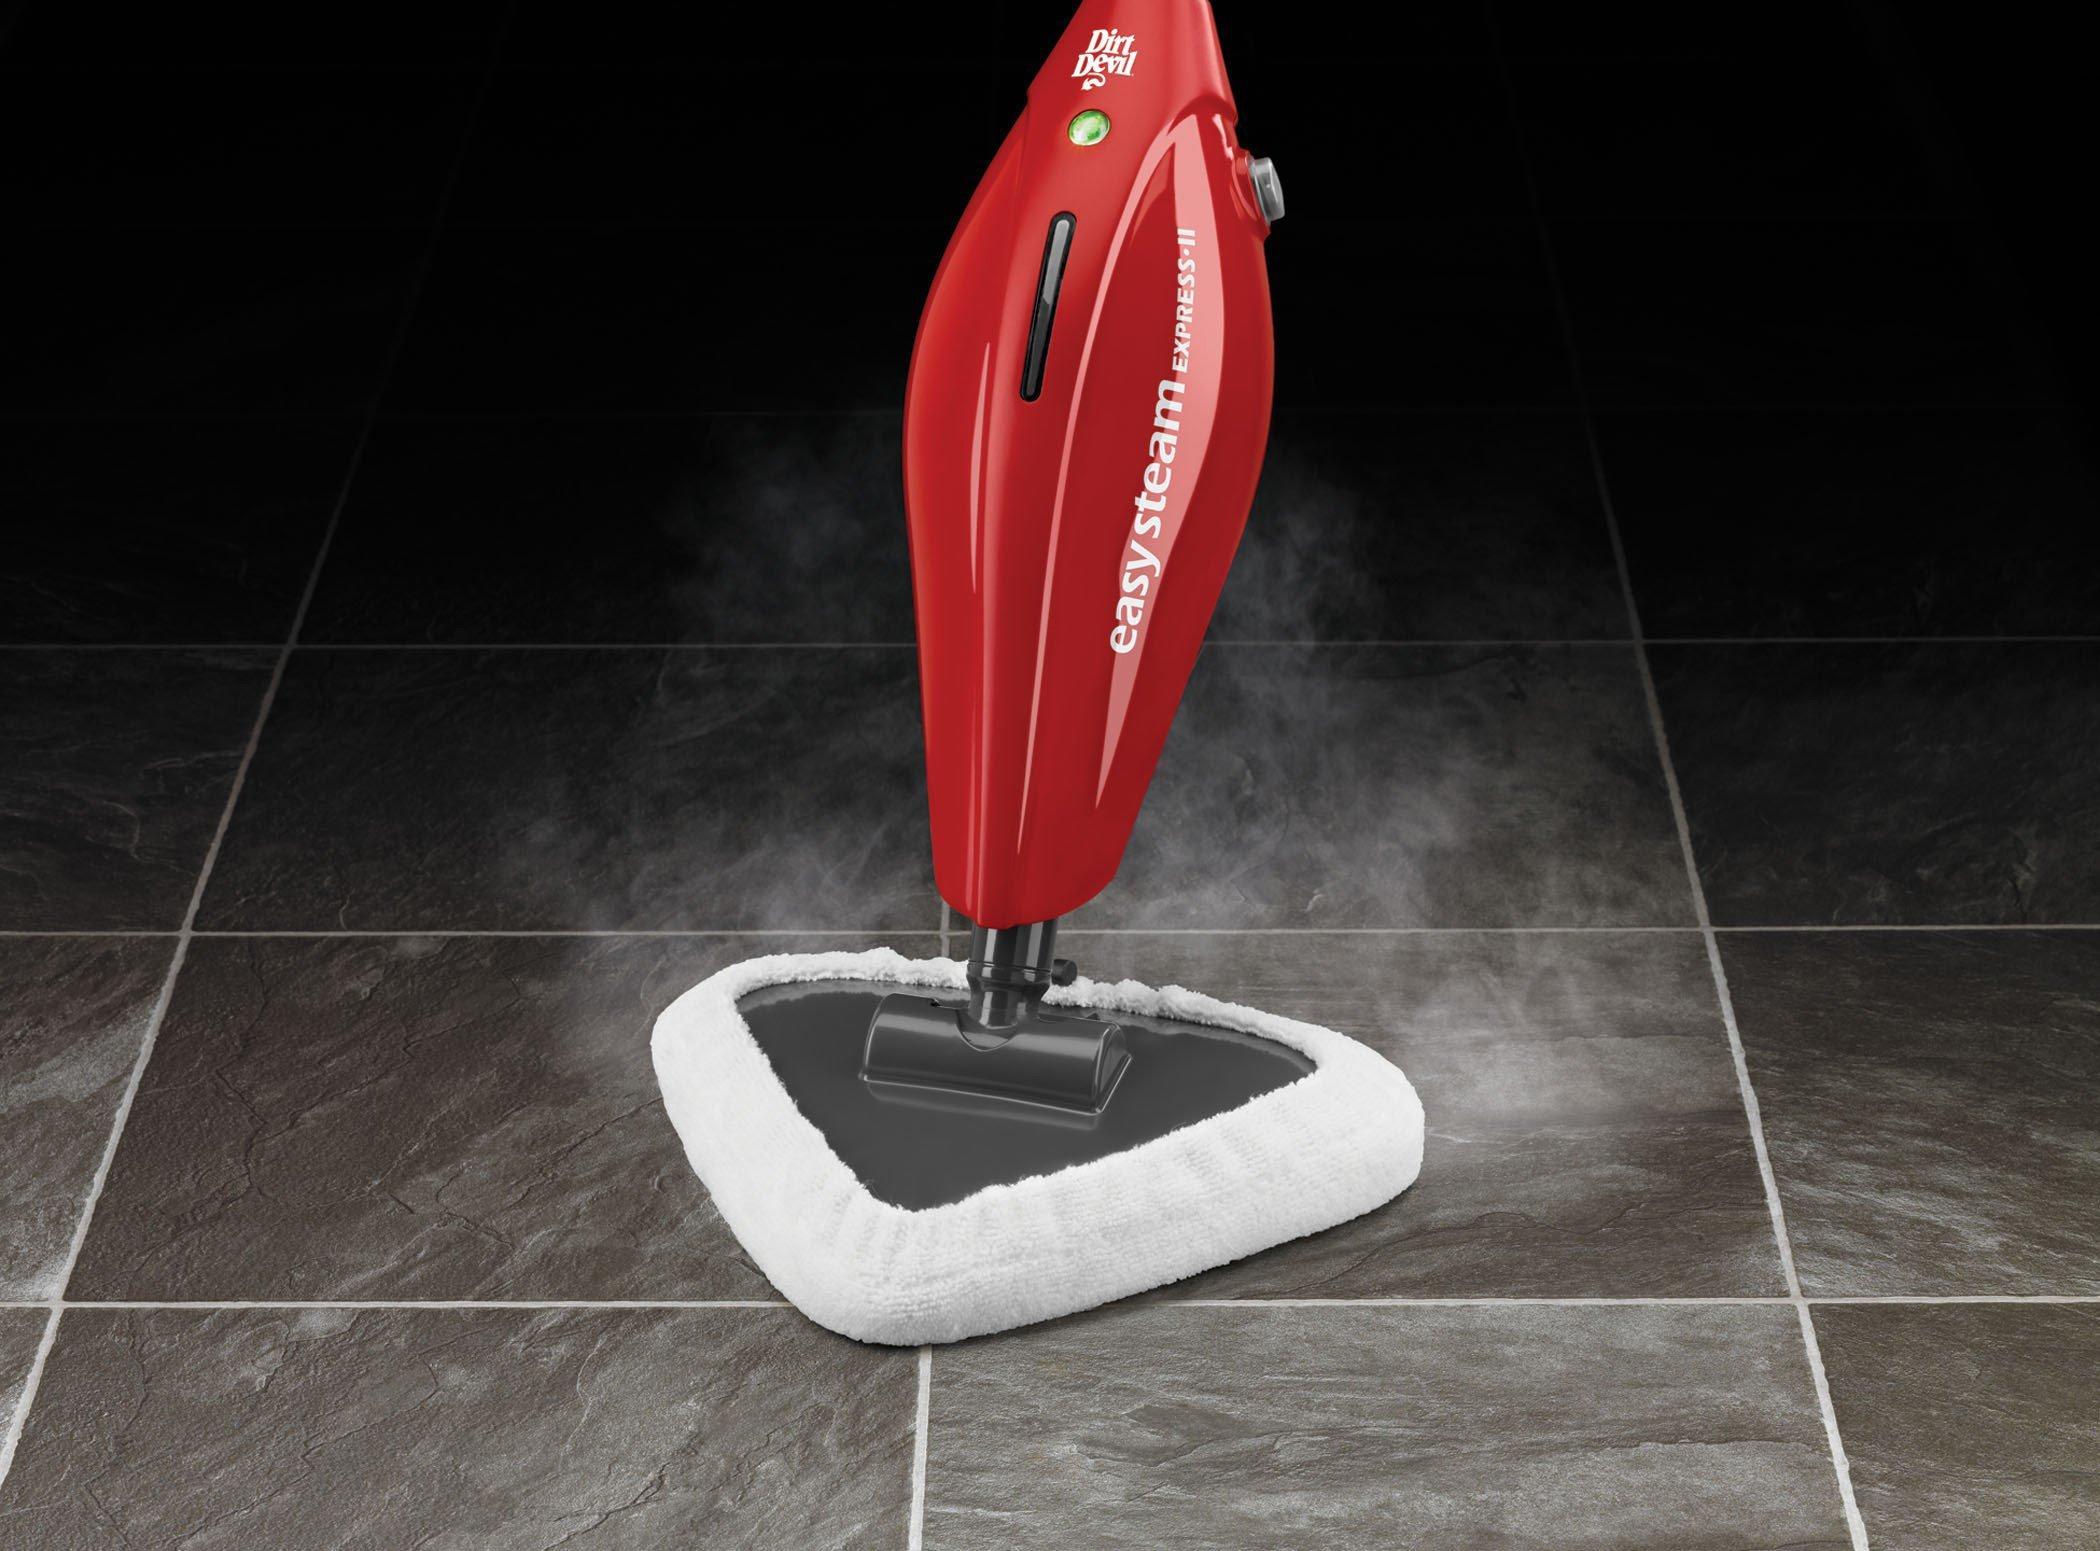 Easy Steam Express II Hard Floor Cleaner5